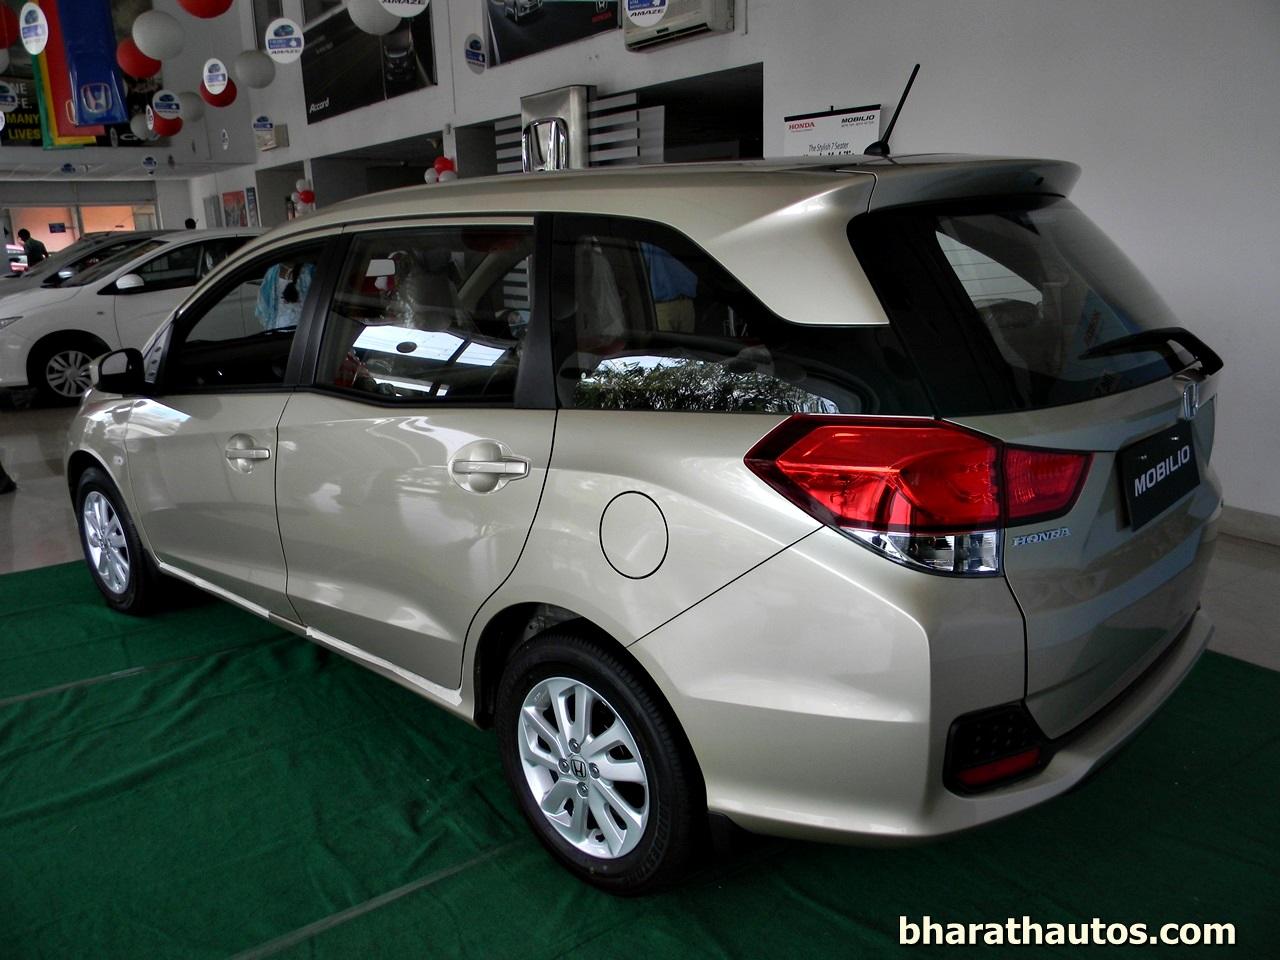 Honda Cars India Launched The 7-seater Honda Mobilio MPV